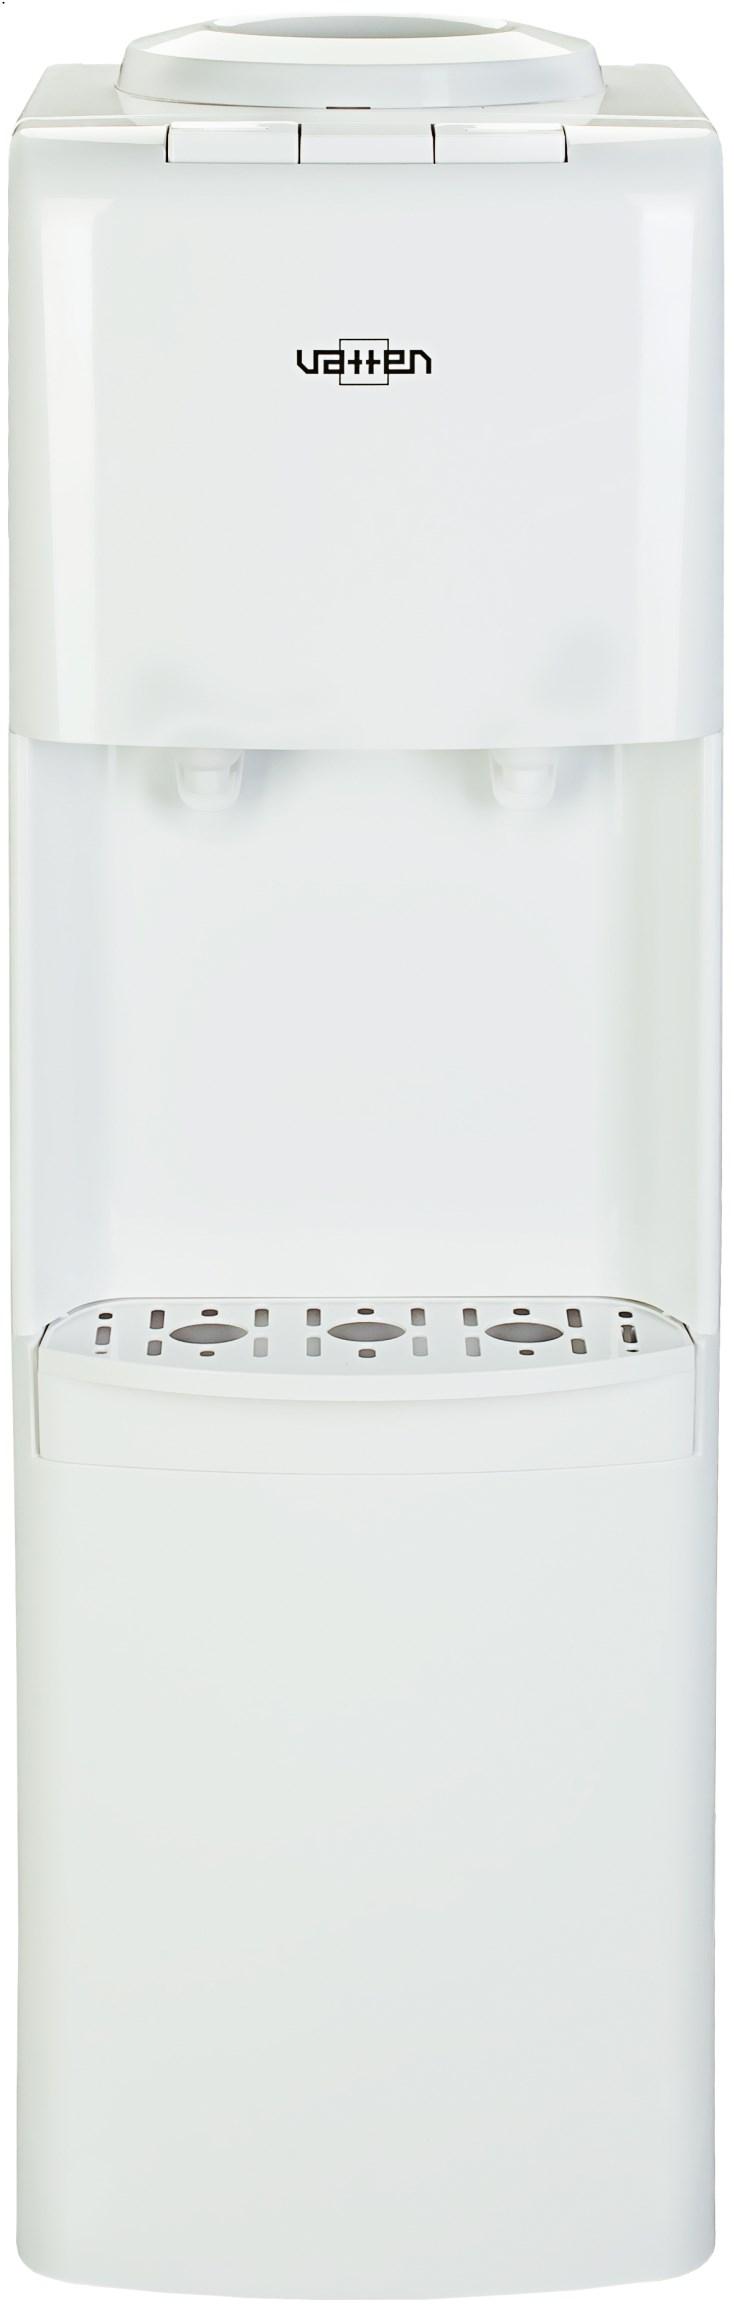 Кулер для воды VATTEN V41WFH